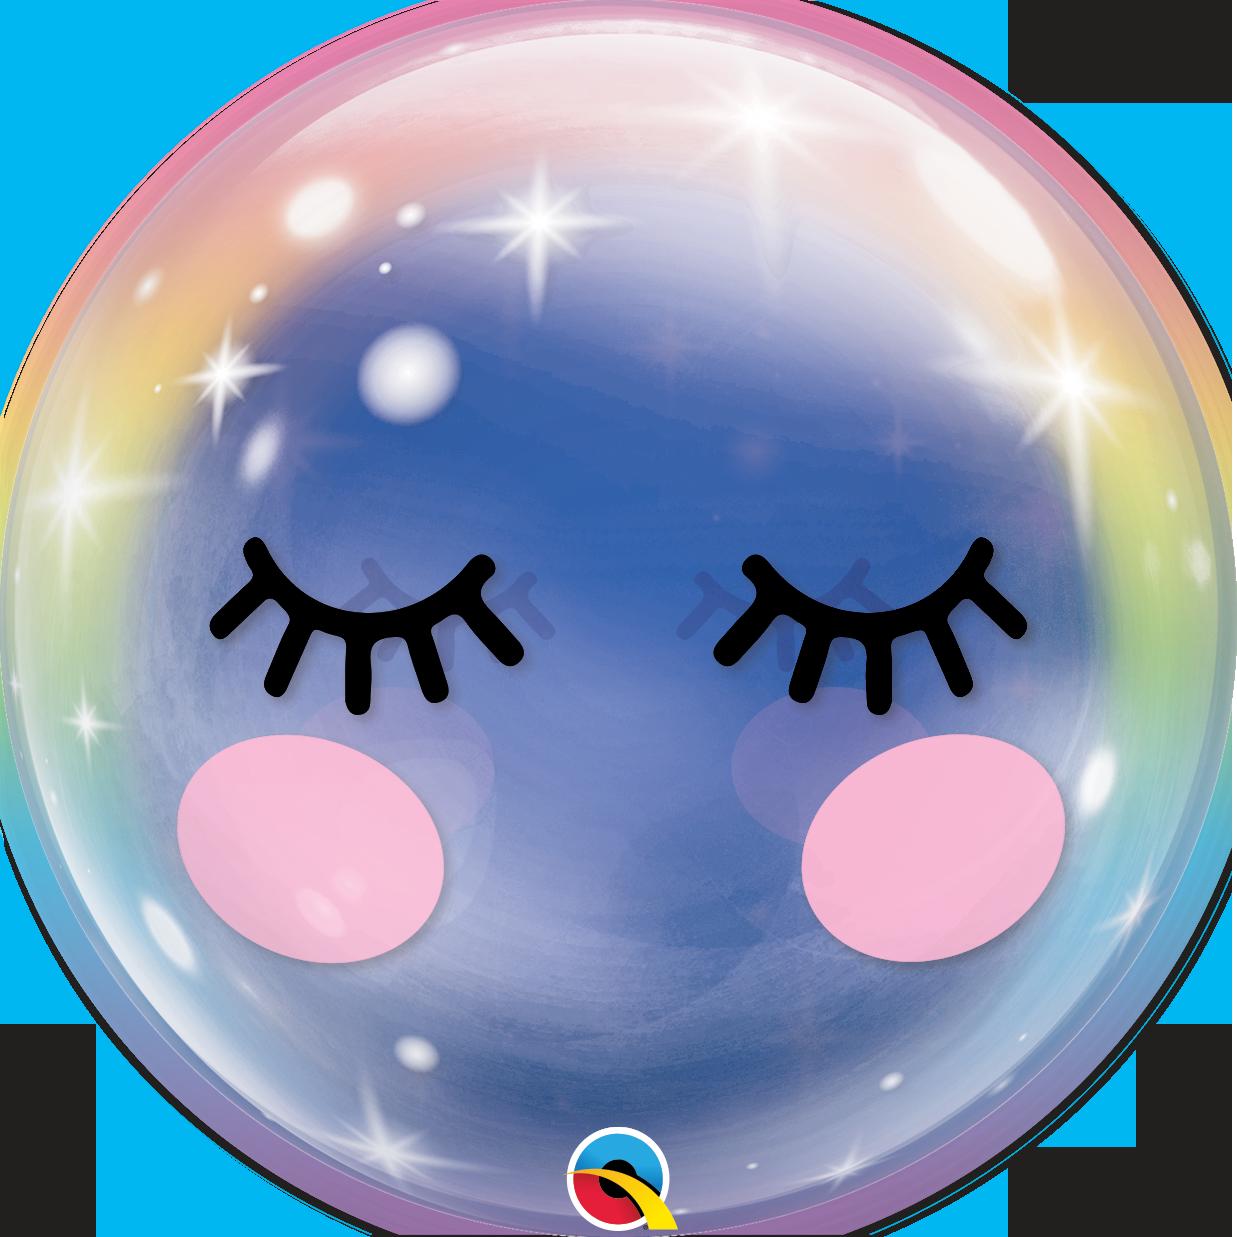 Bubble pestanas